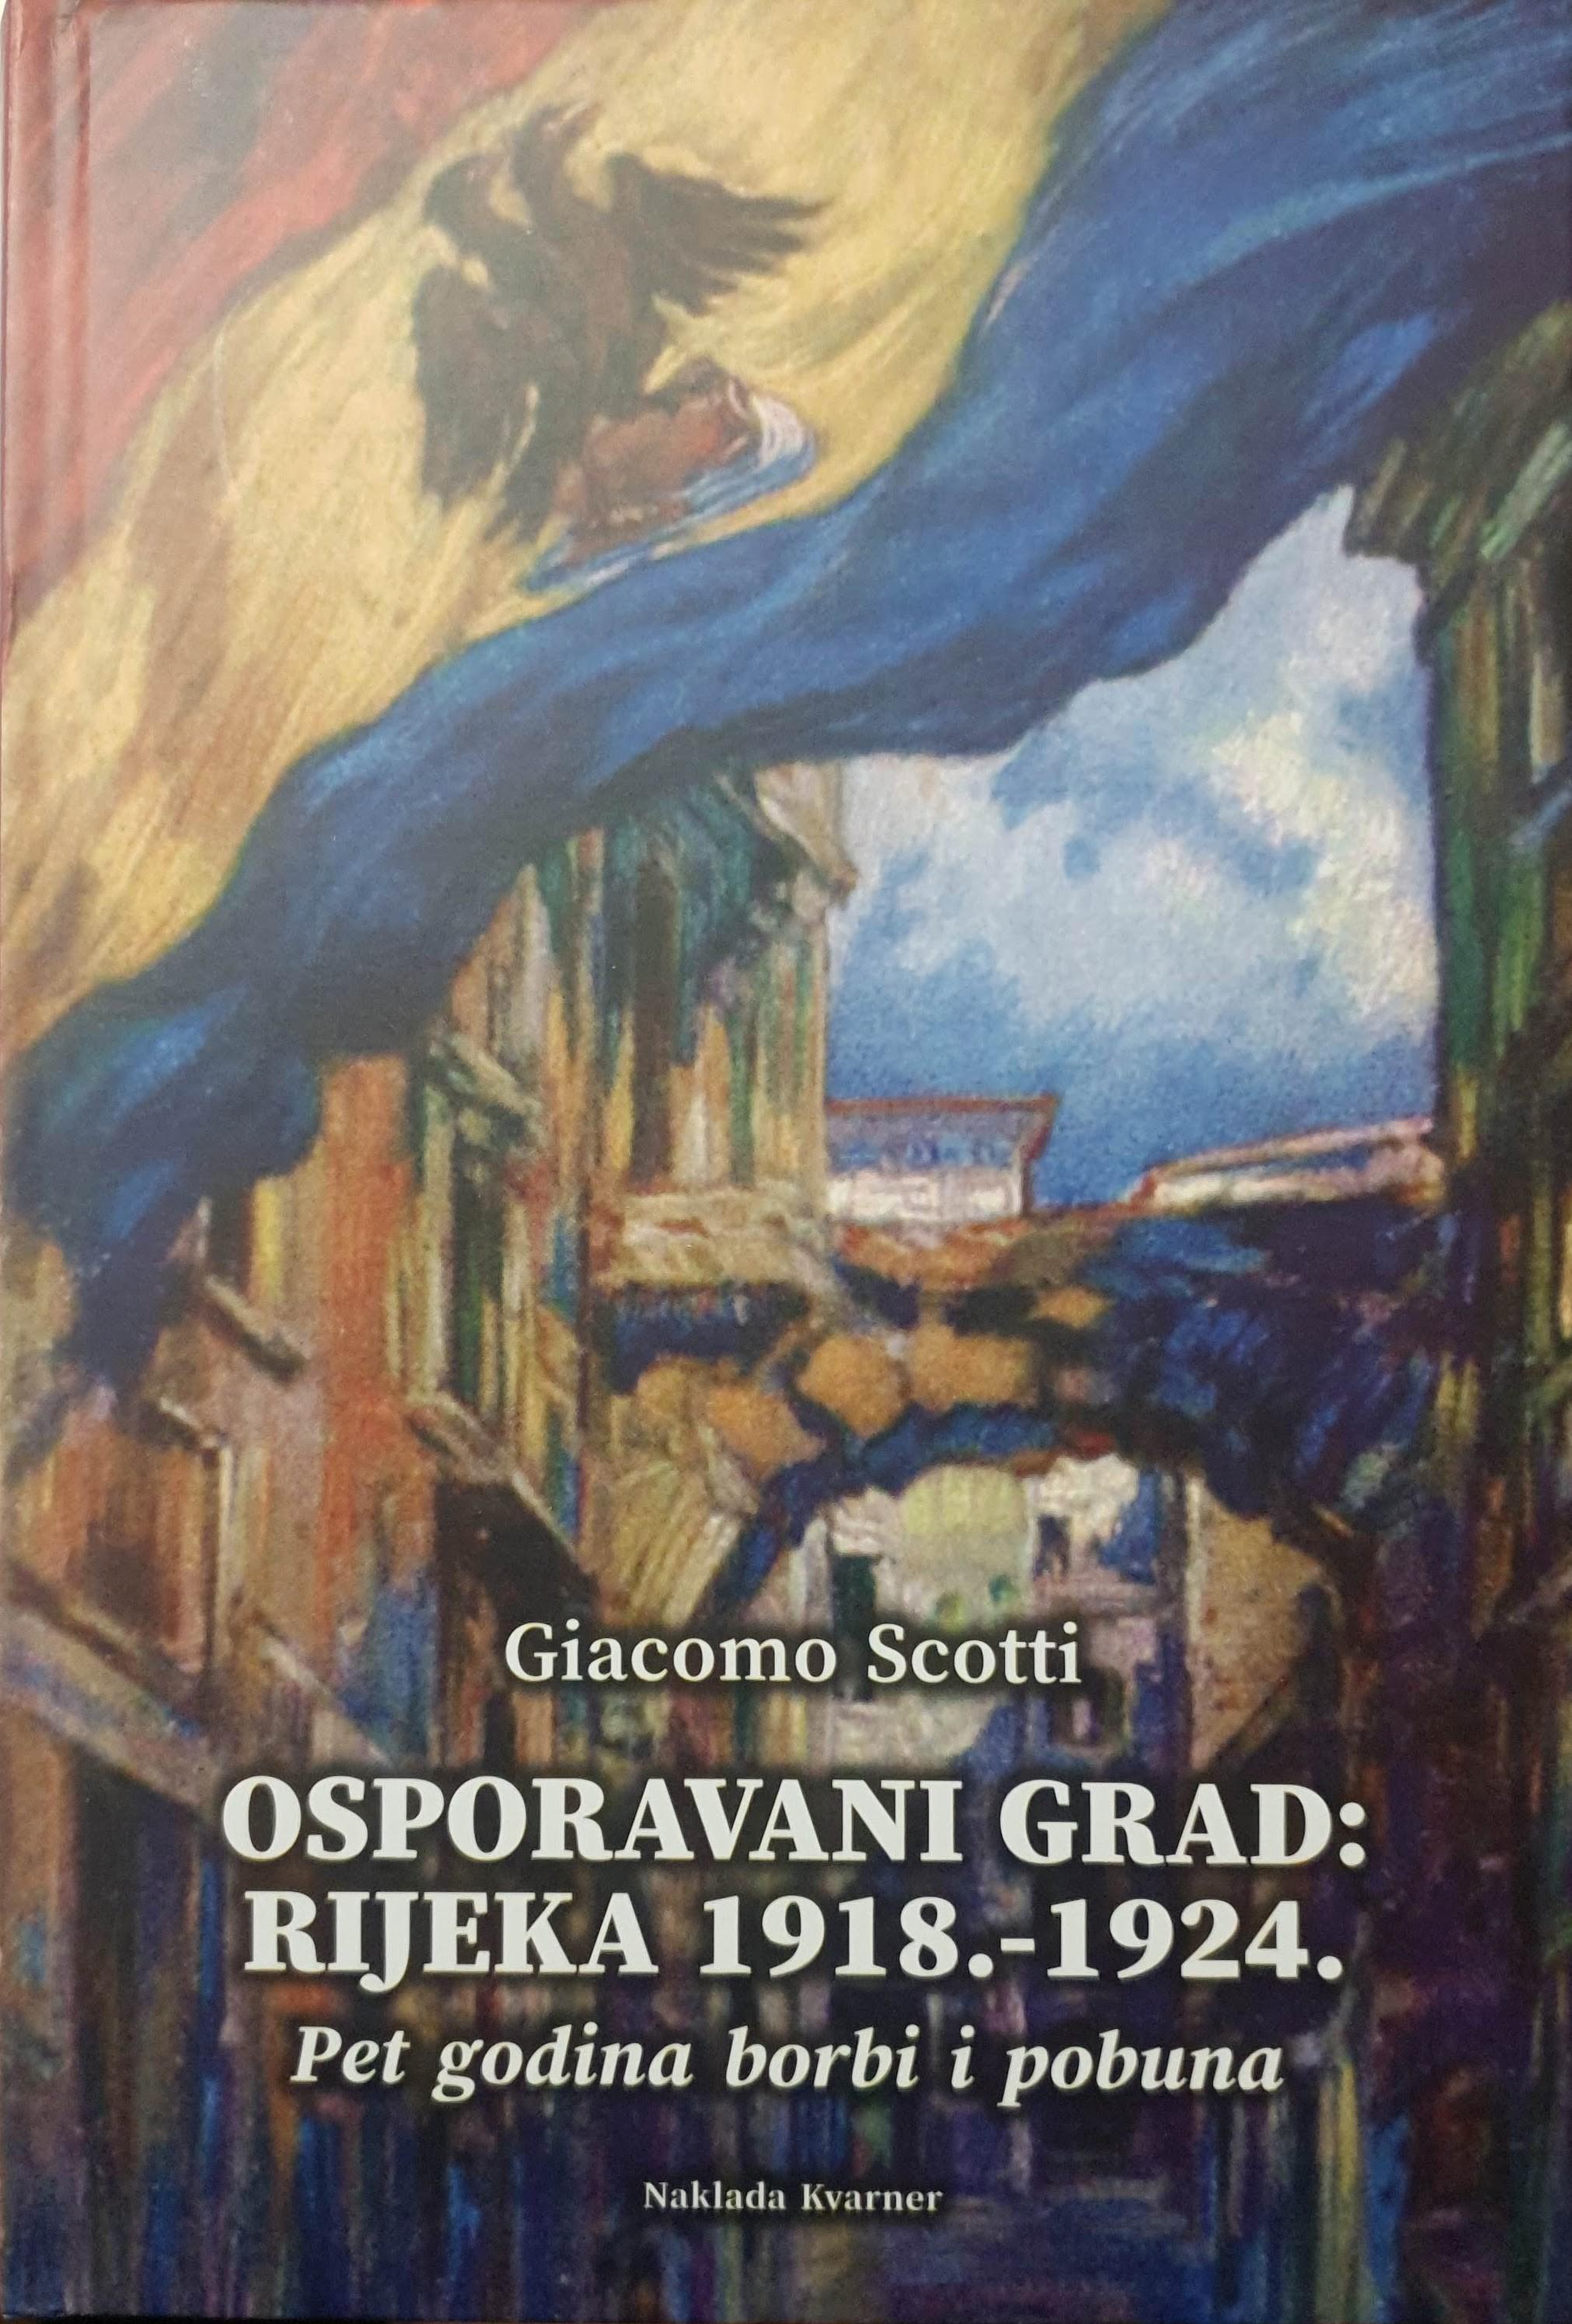 Giacomo Scotti: OSPORAVANI GRAD: Rijeka 1918.-1924.